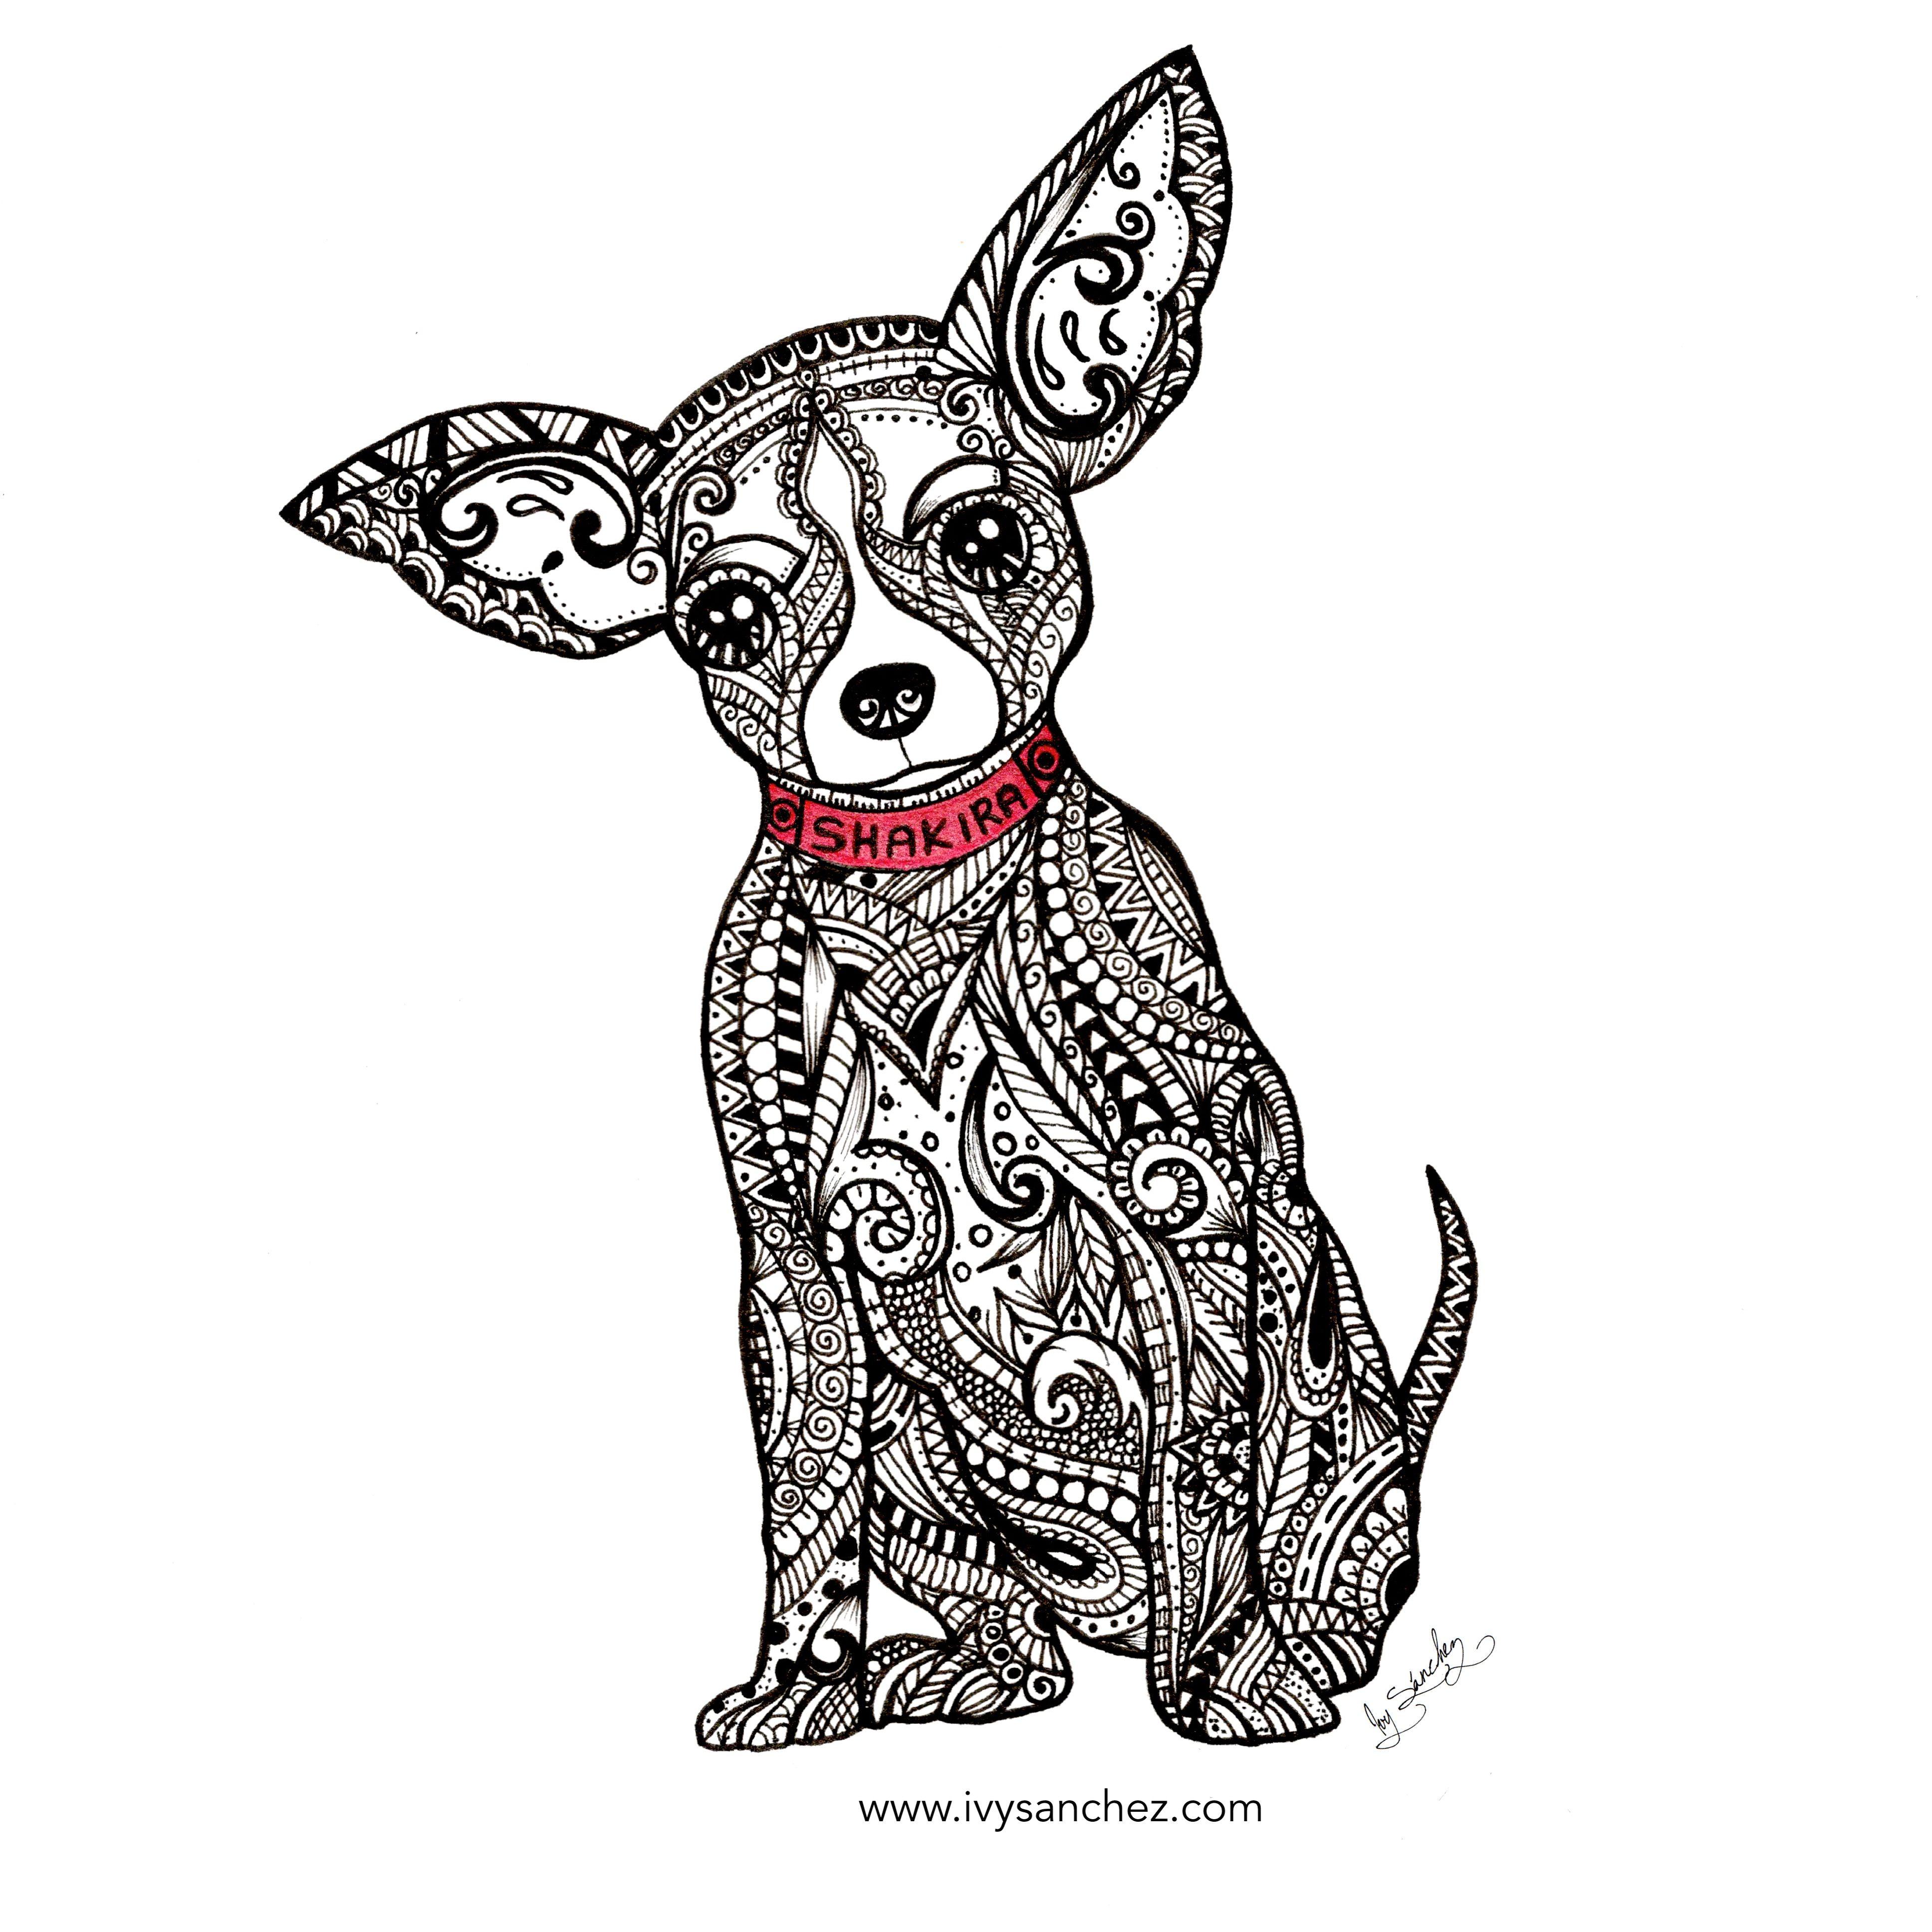 chihuahua zendoodle dog handmade ink illustration zentangle